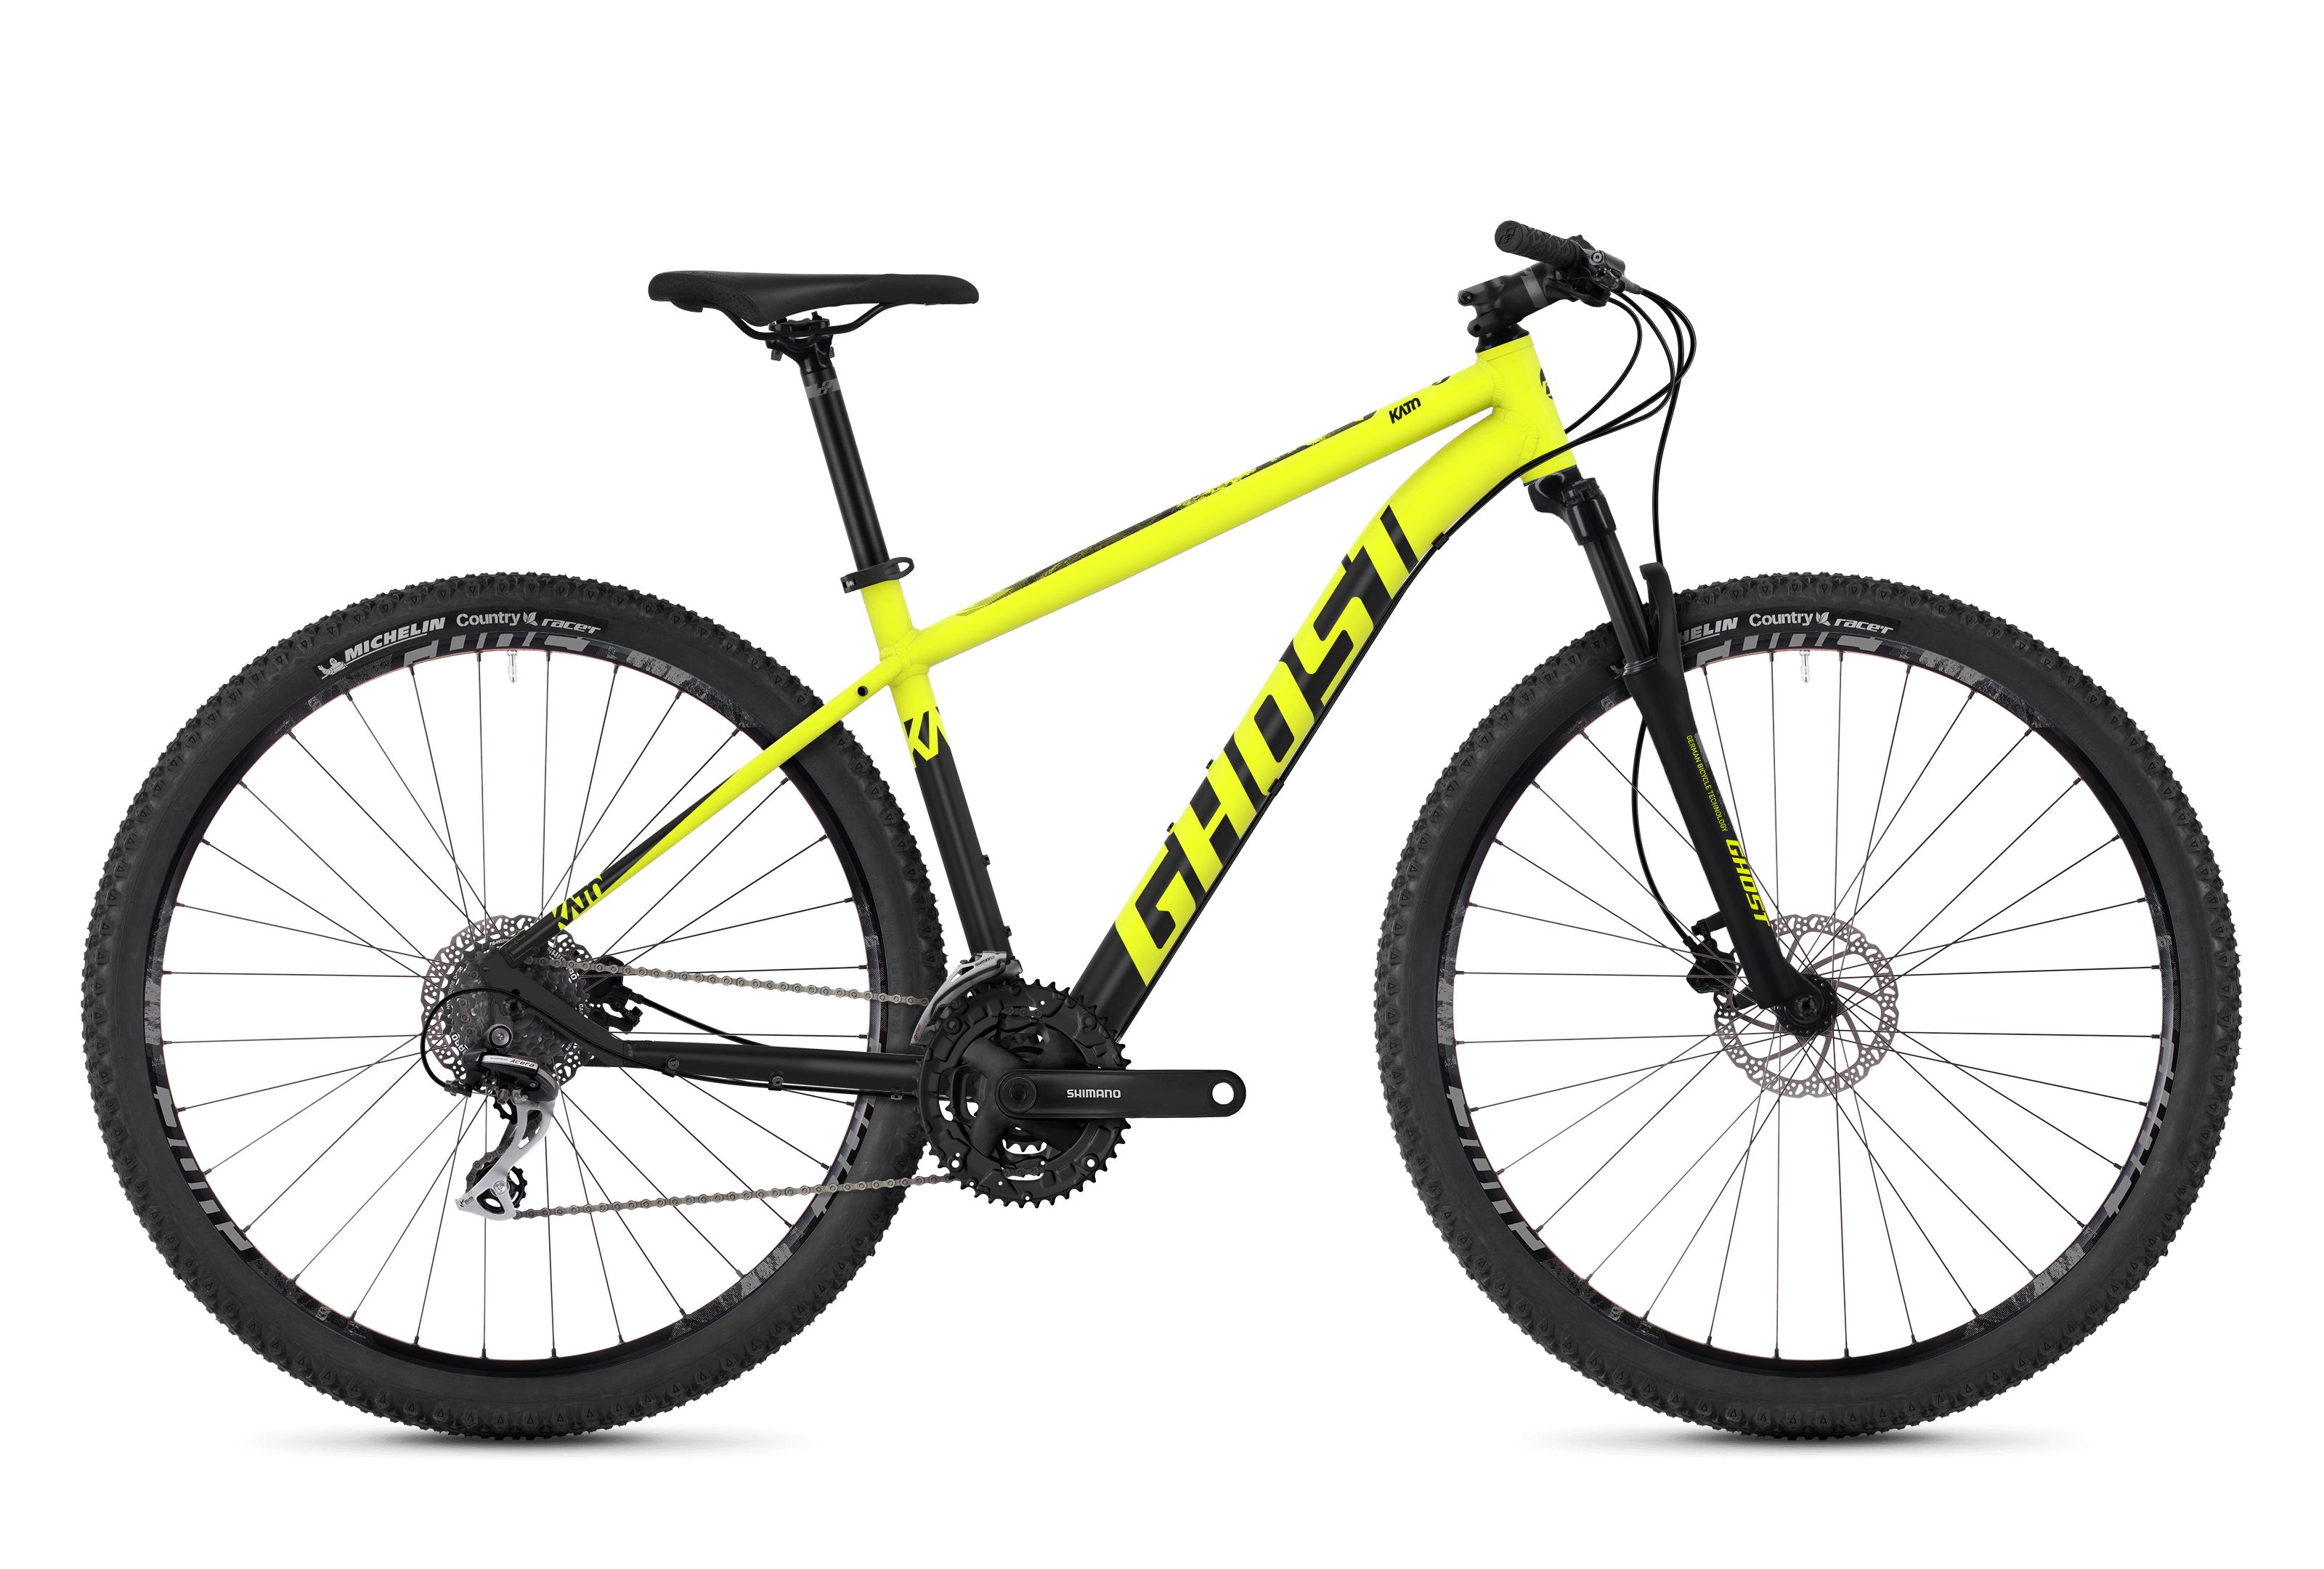 Horské kolo GHOST Kato 2.9 yellow / black S 2018